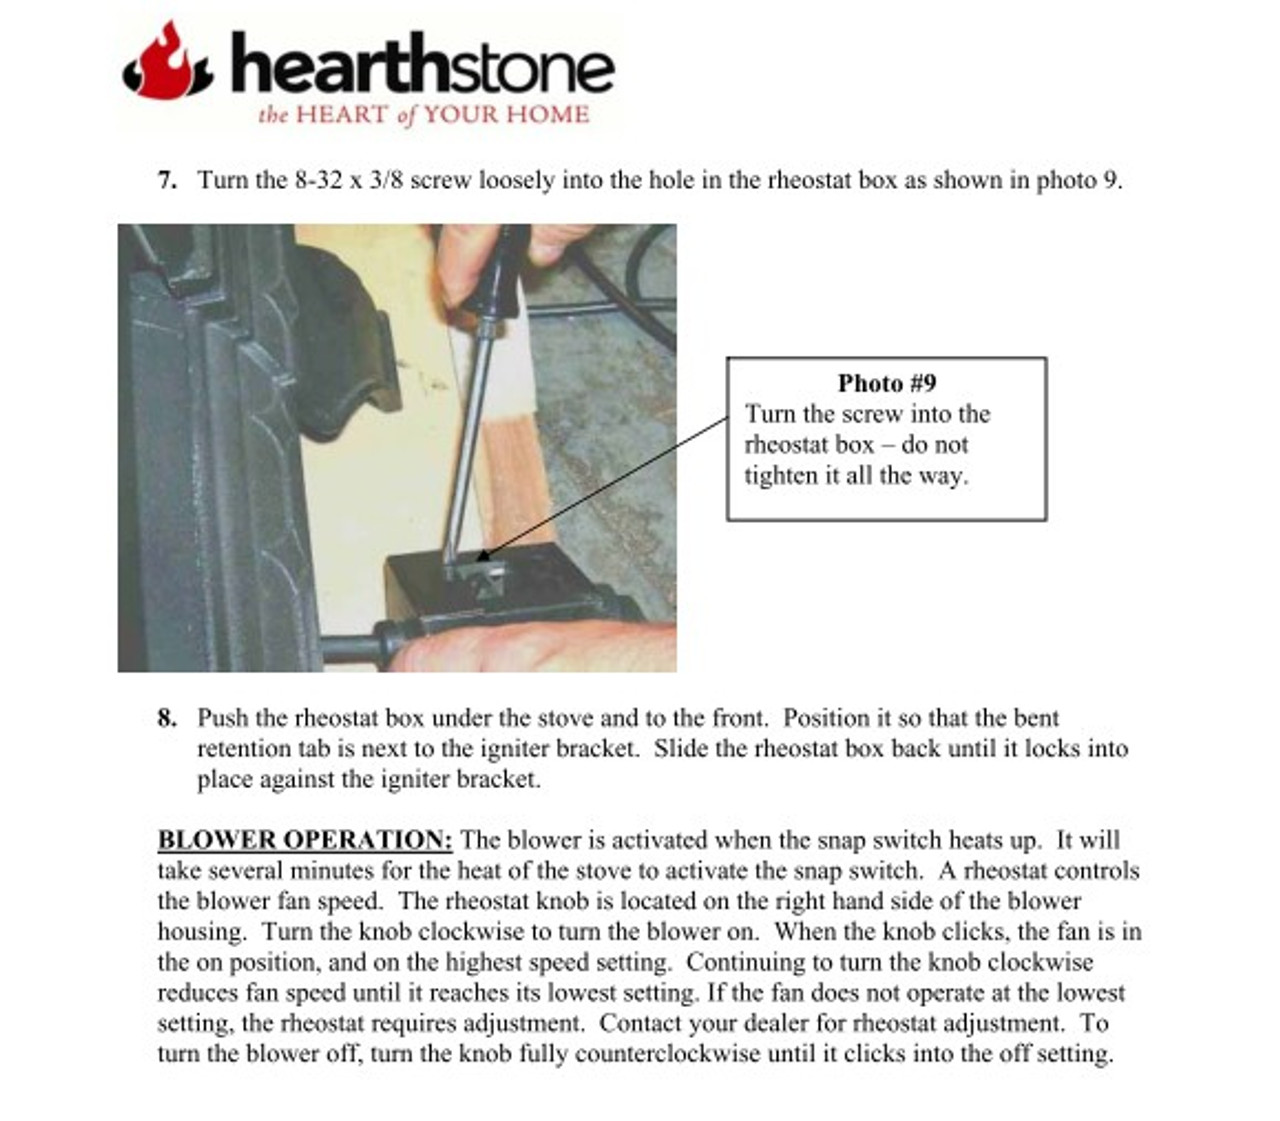 HearthStone Tribute Gas Stove Blower